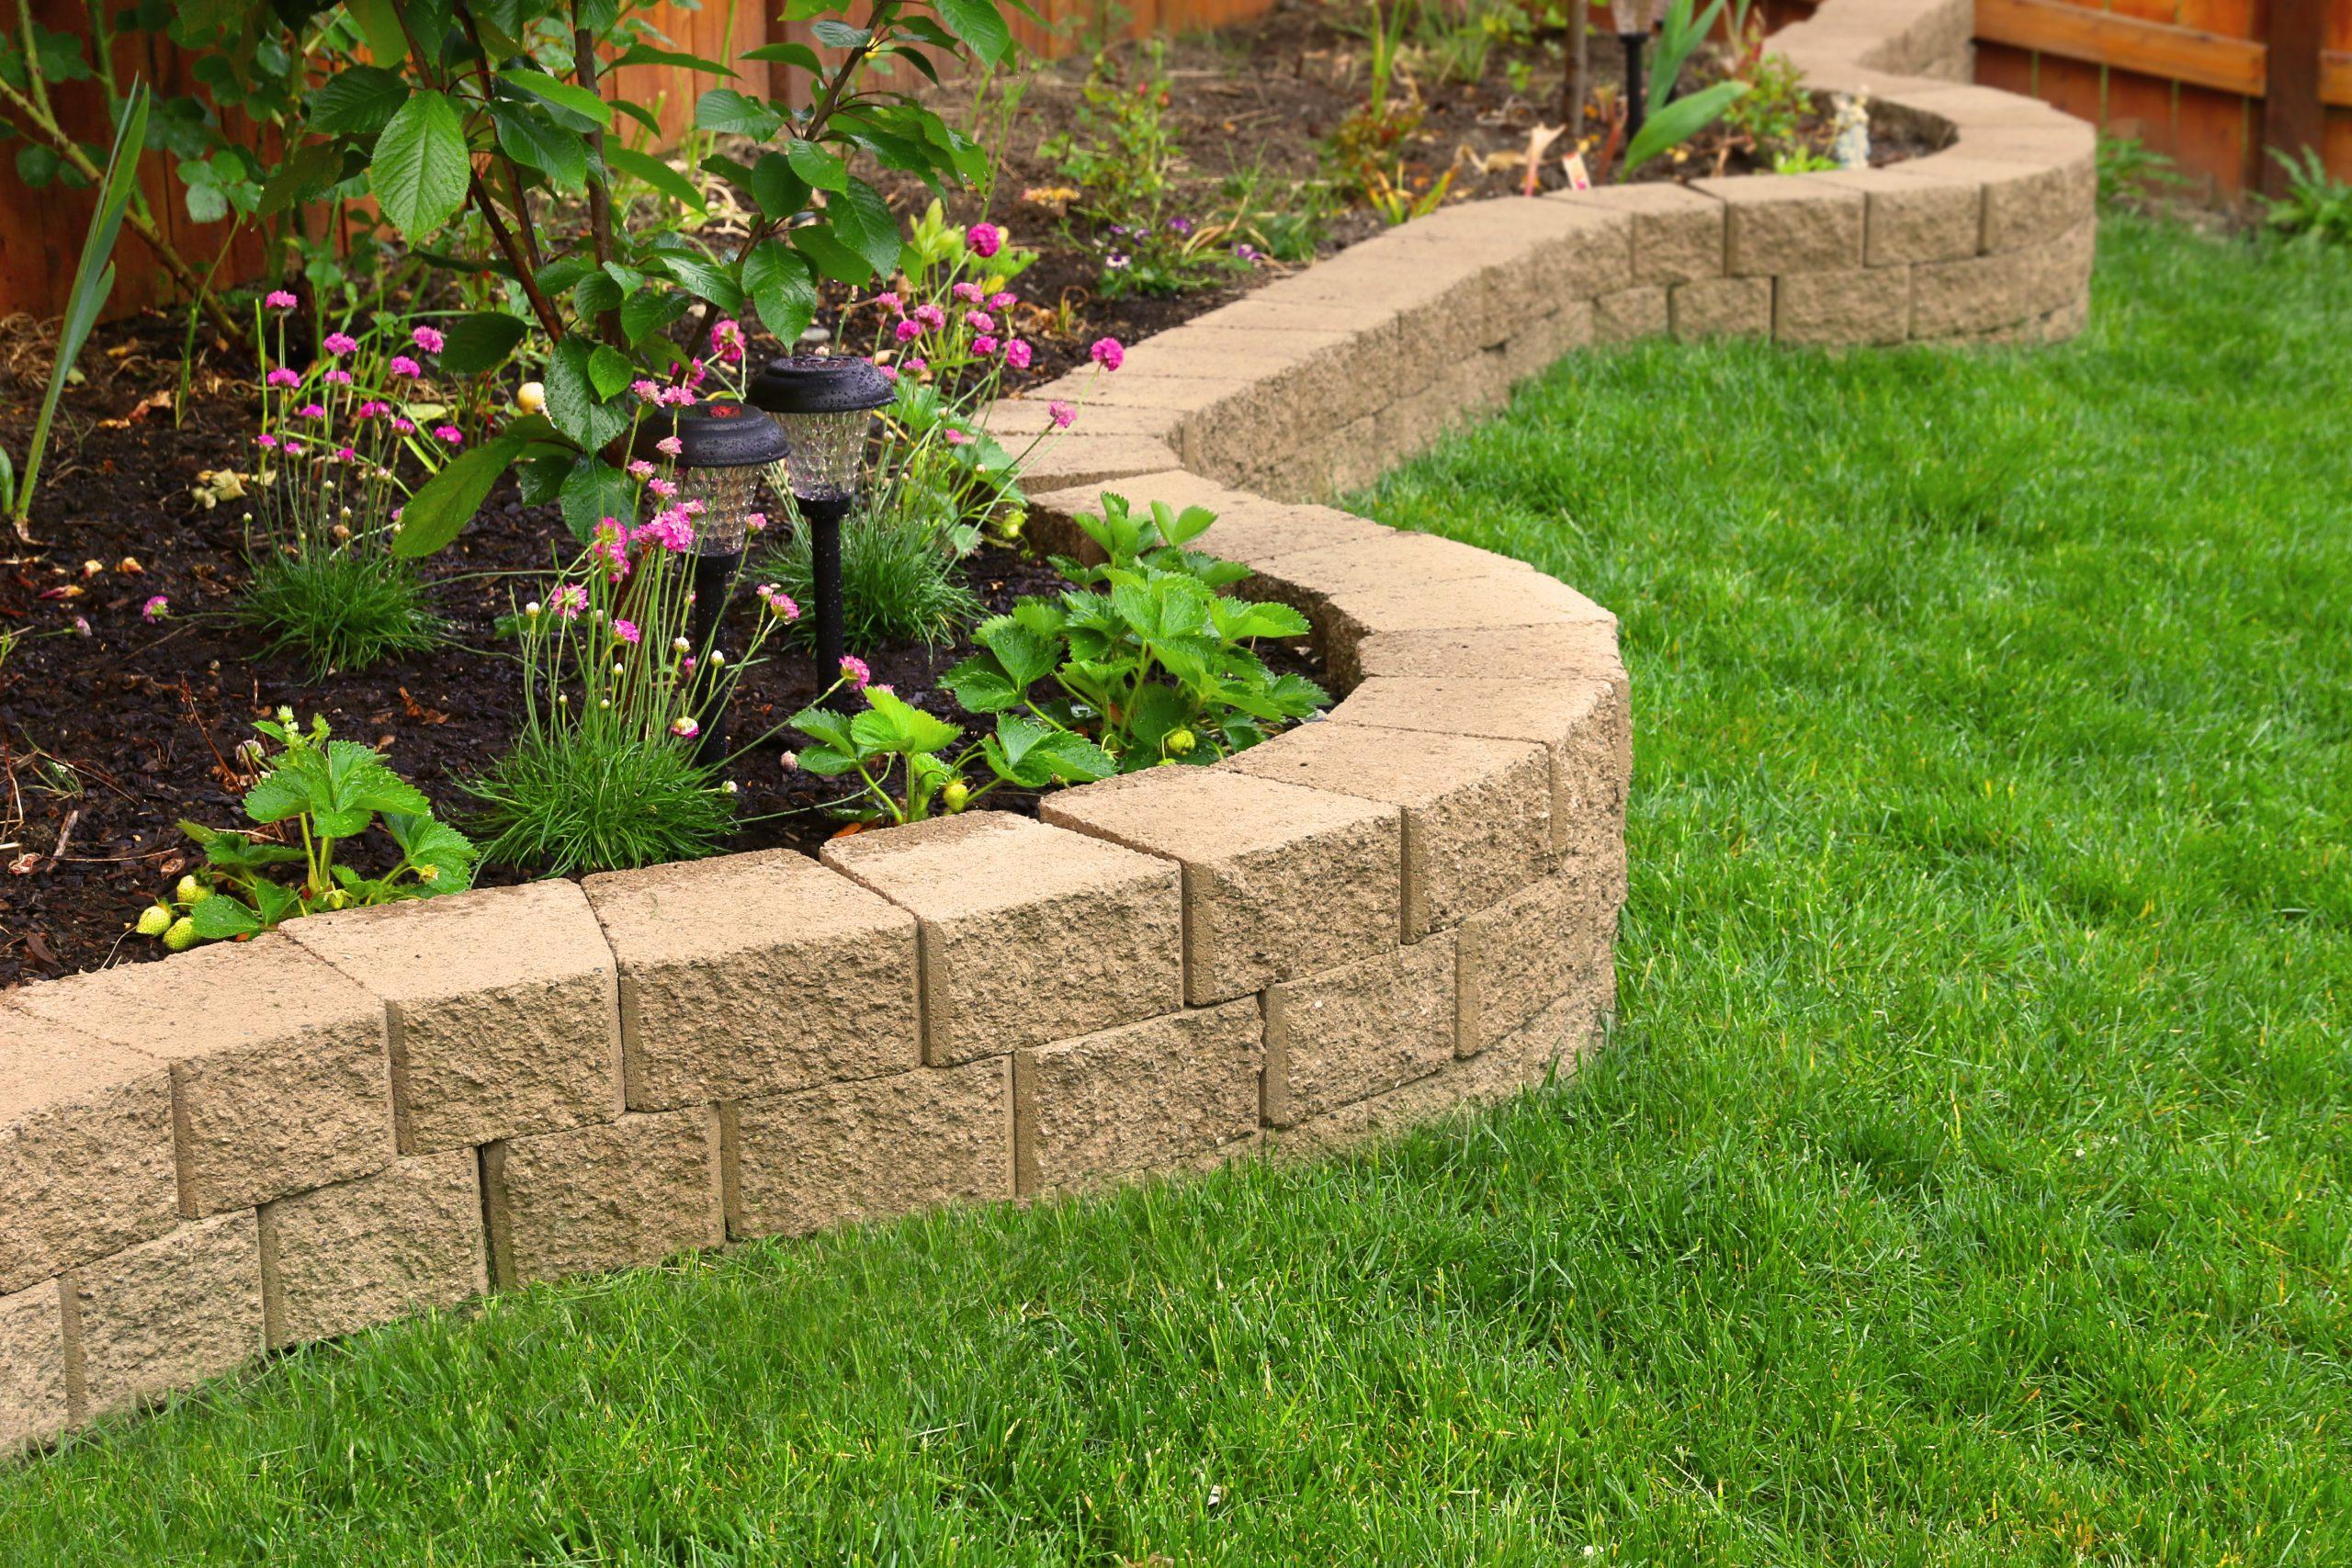 residential landscaping company tulsa oklahoma best landscapers retaining wall retaining wall builder garden wall